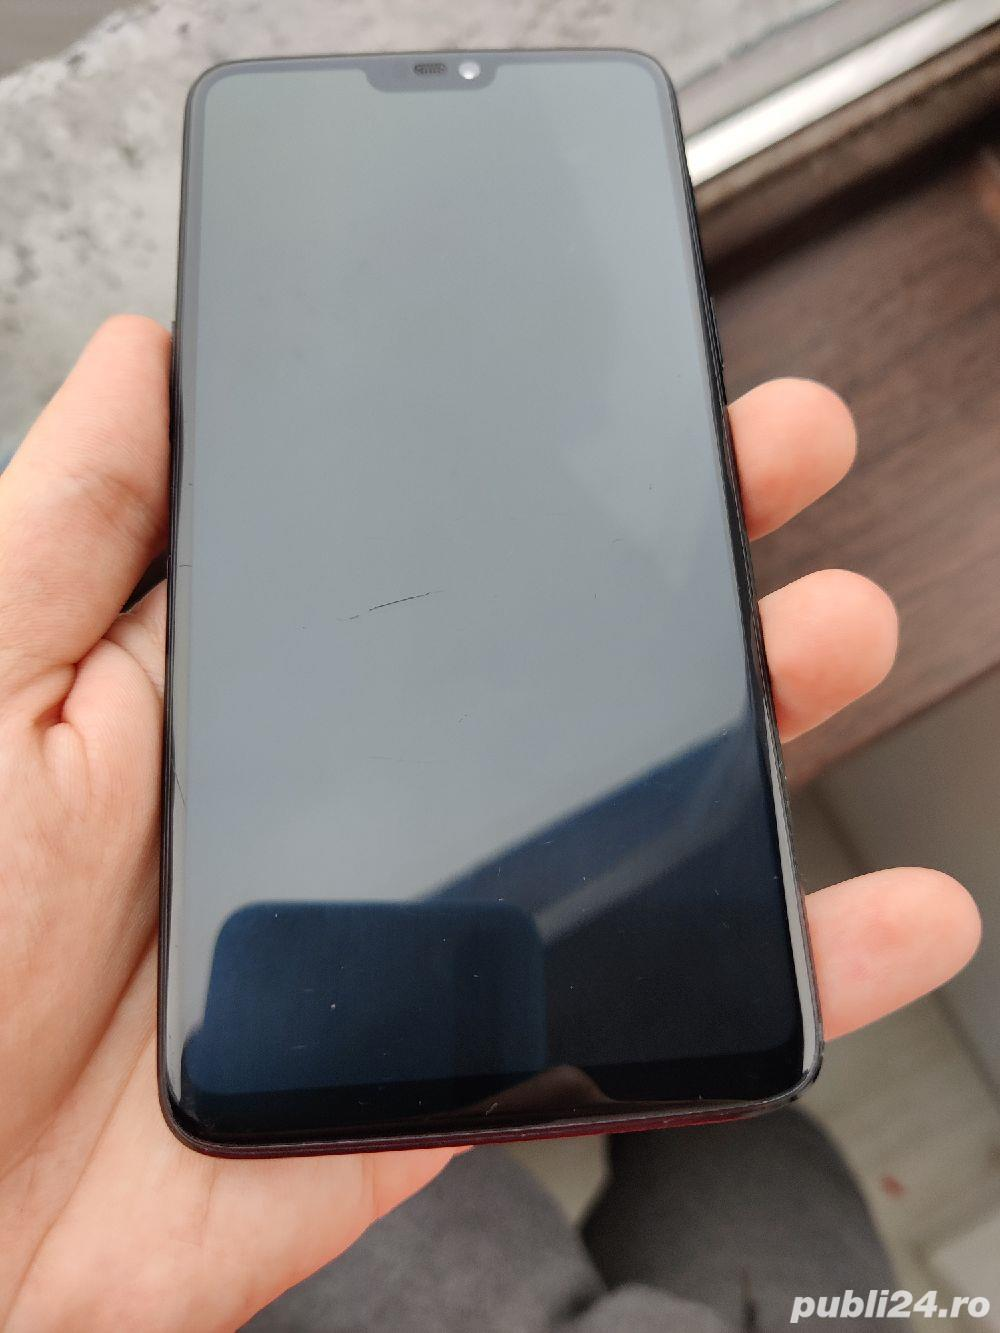 OnePlus 6 6GB RAM + 64 GB ROM (stocare)